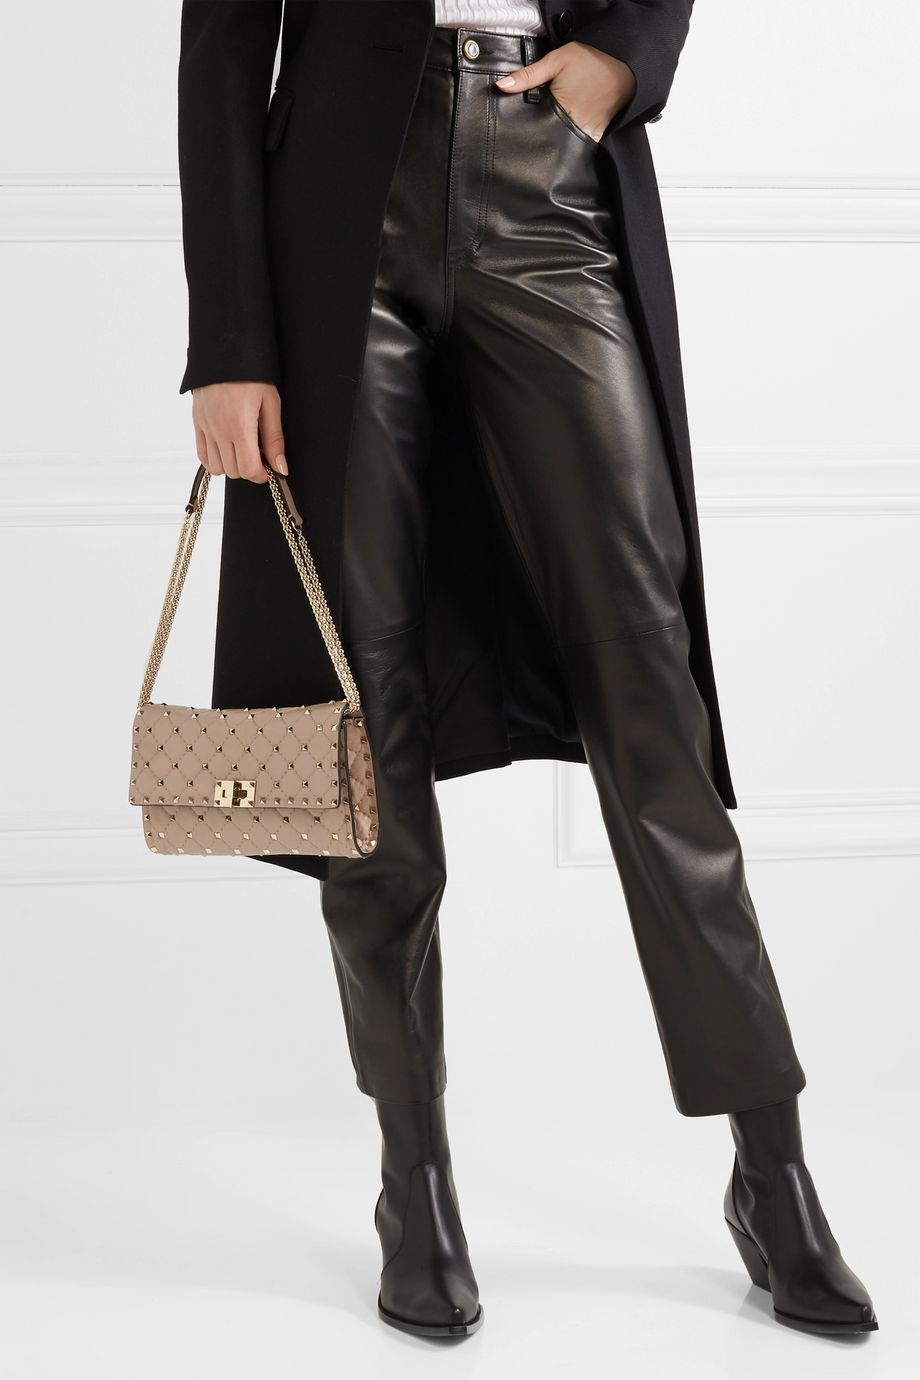 Valentino Valentino Garavani The Rockstud Spike quilted leather shoulder bag